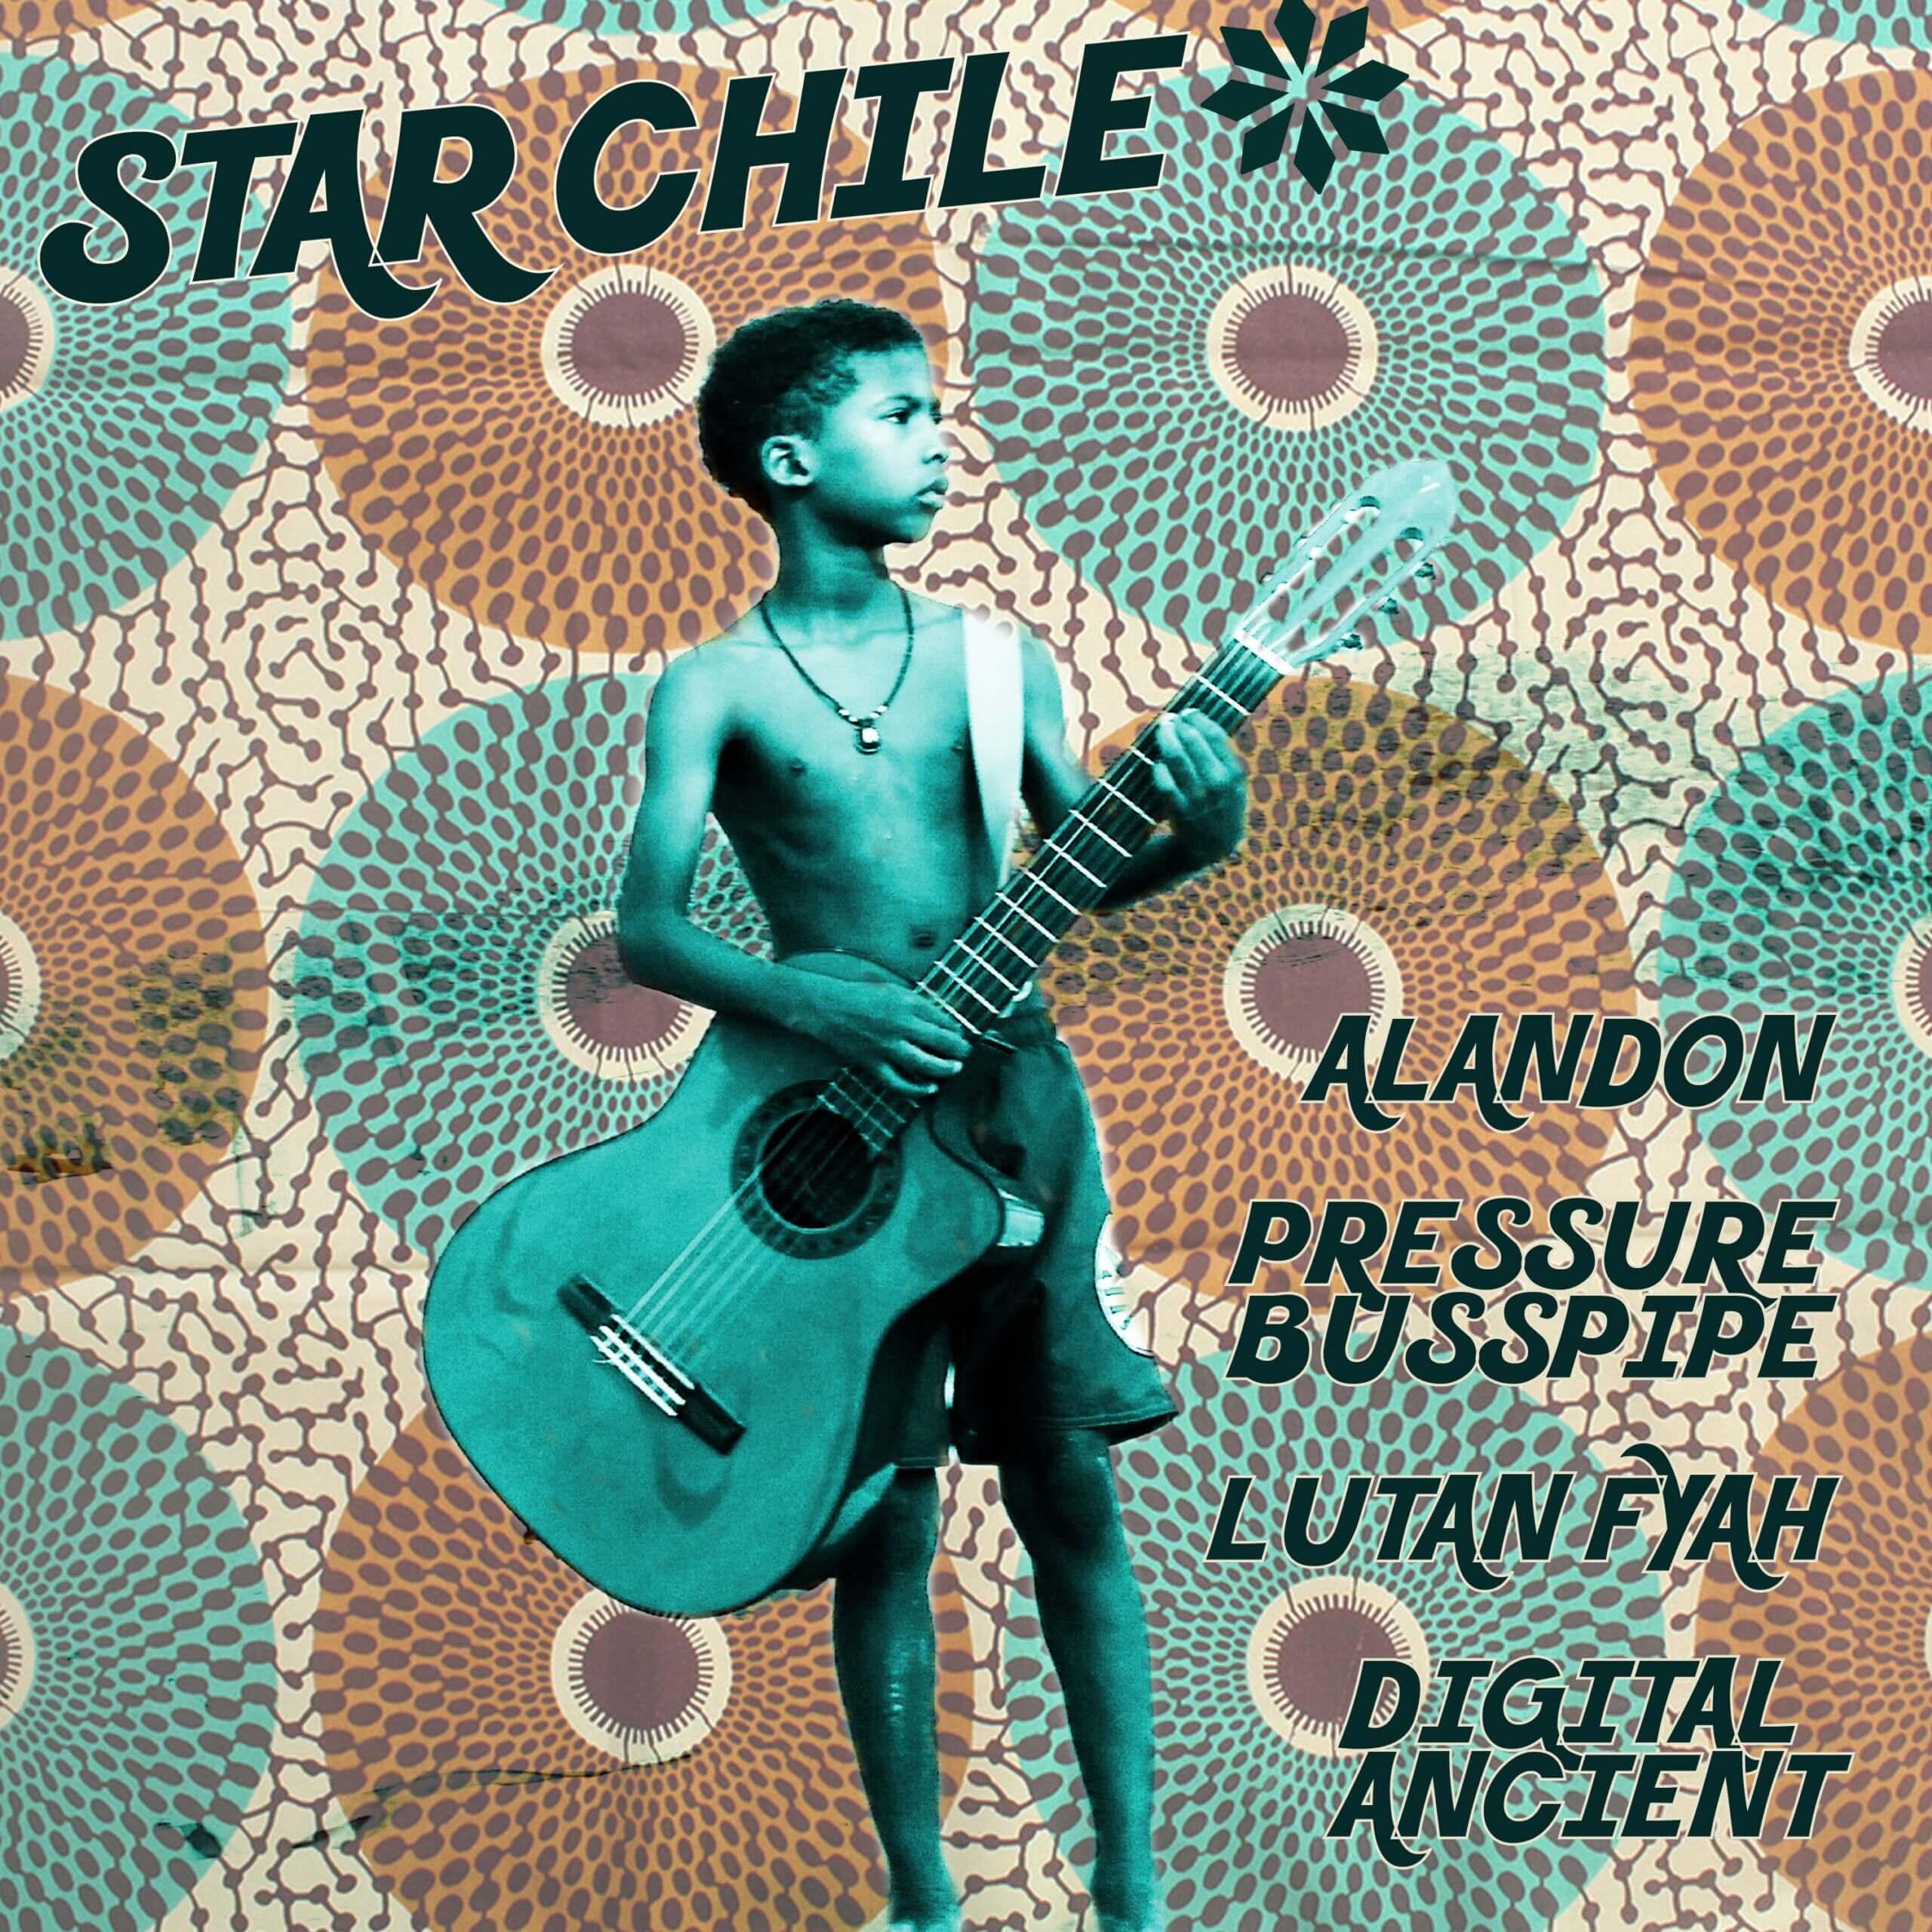 Star Chile